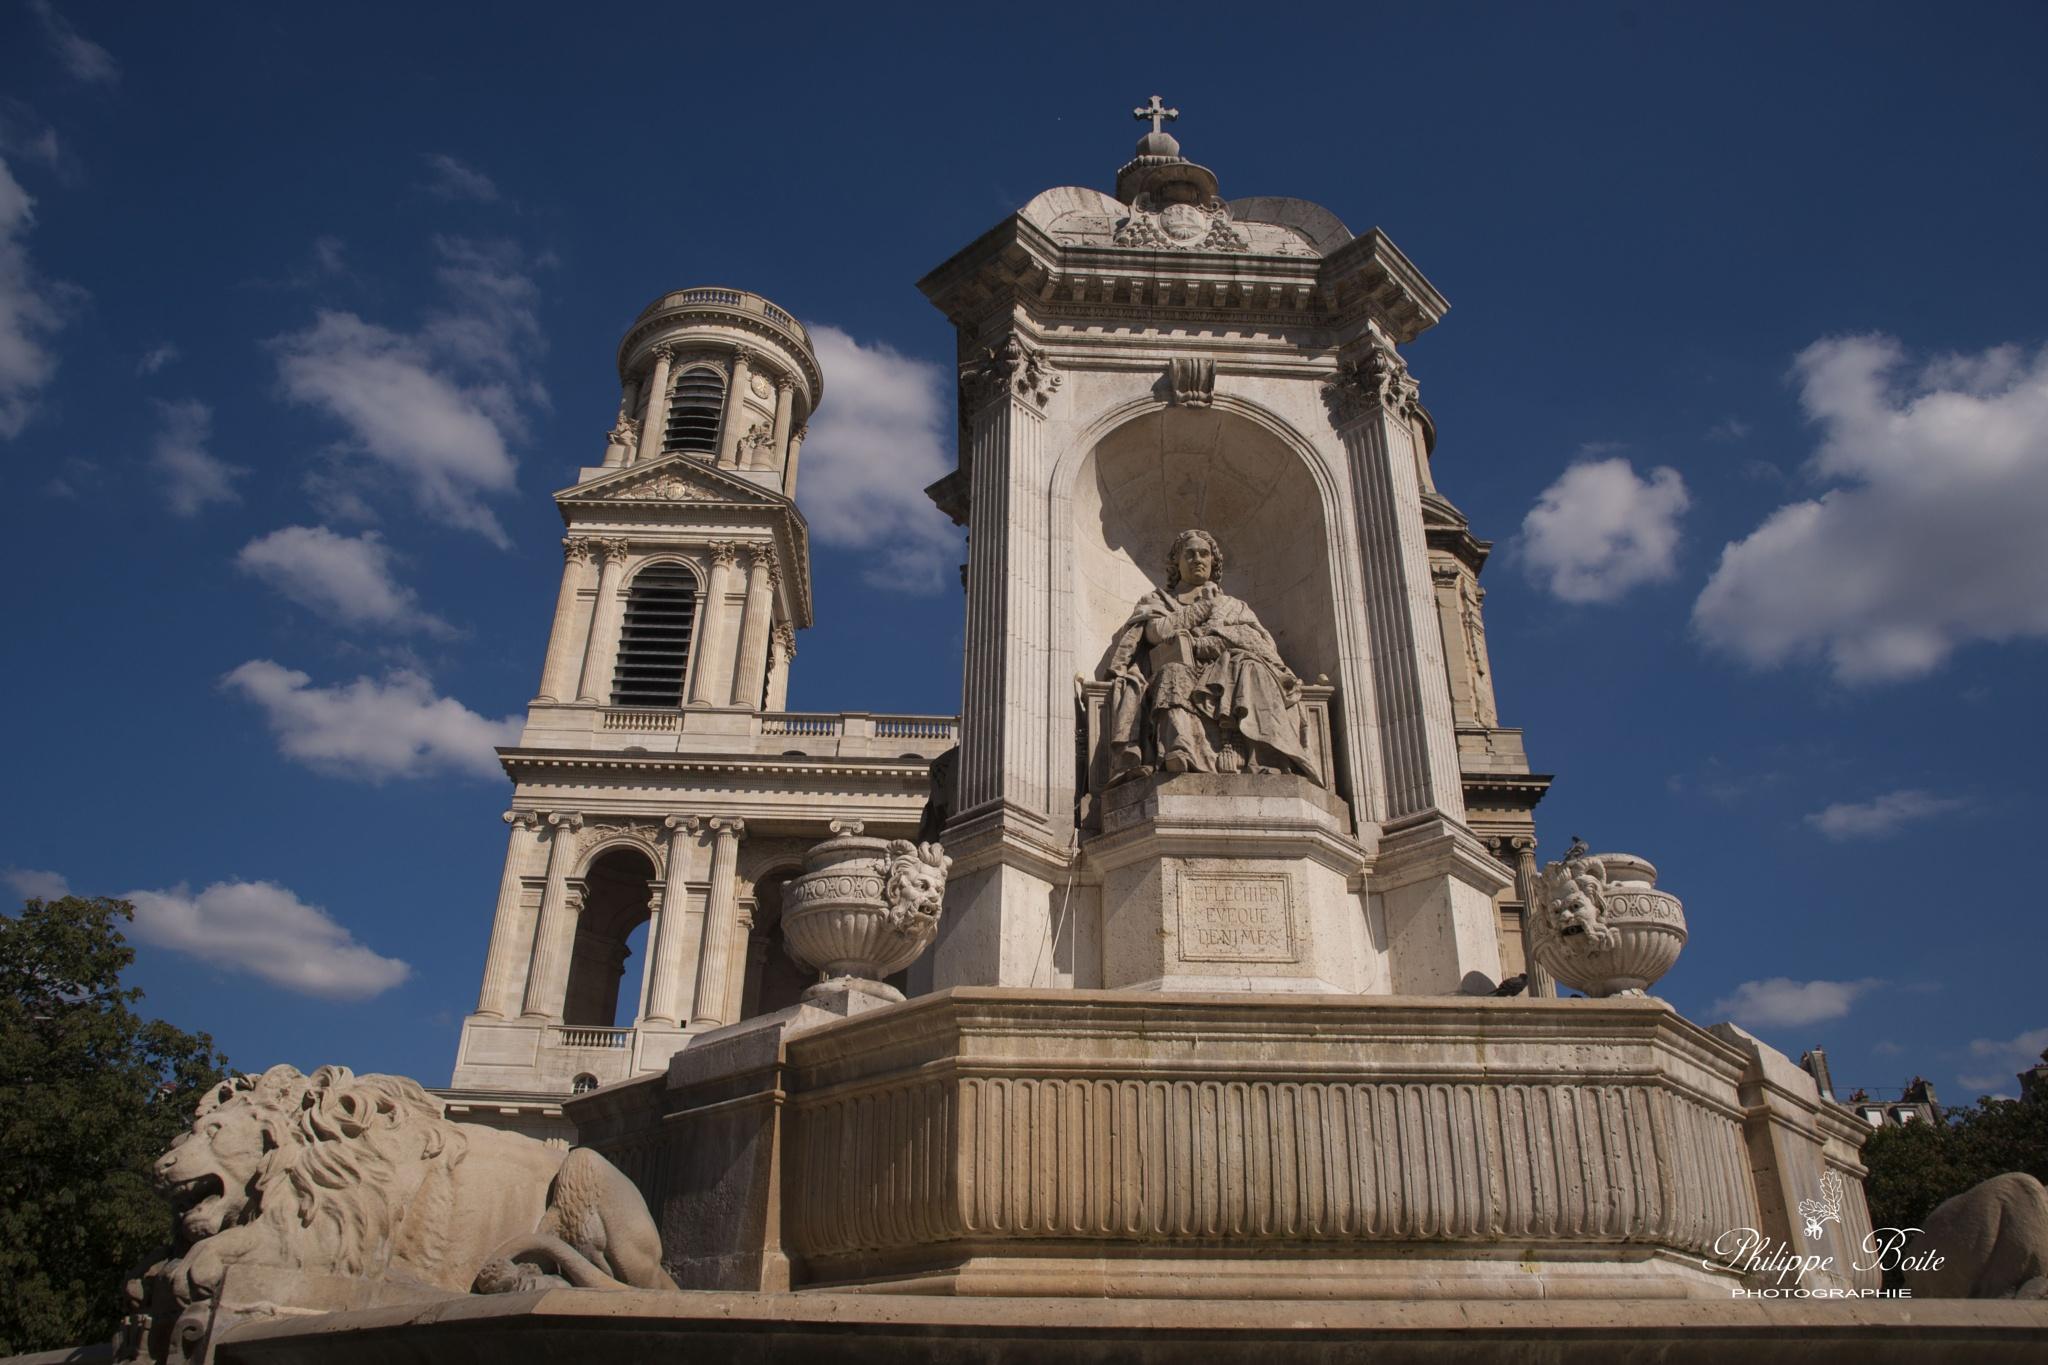 Saint-Sulpice by Philippe Boite